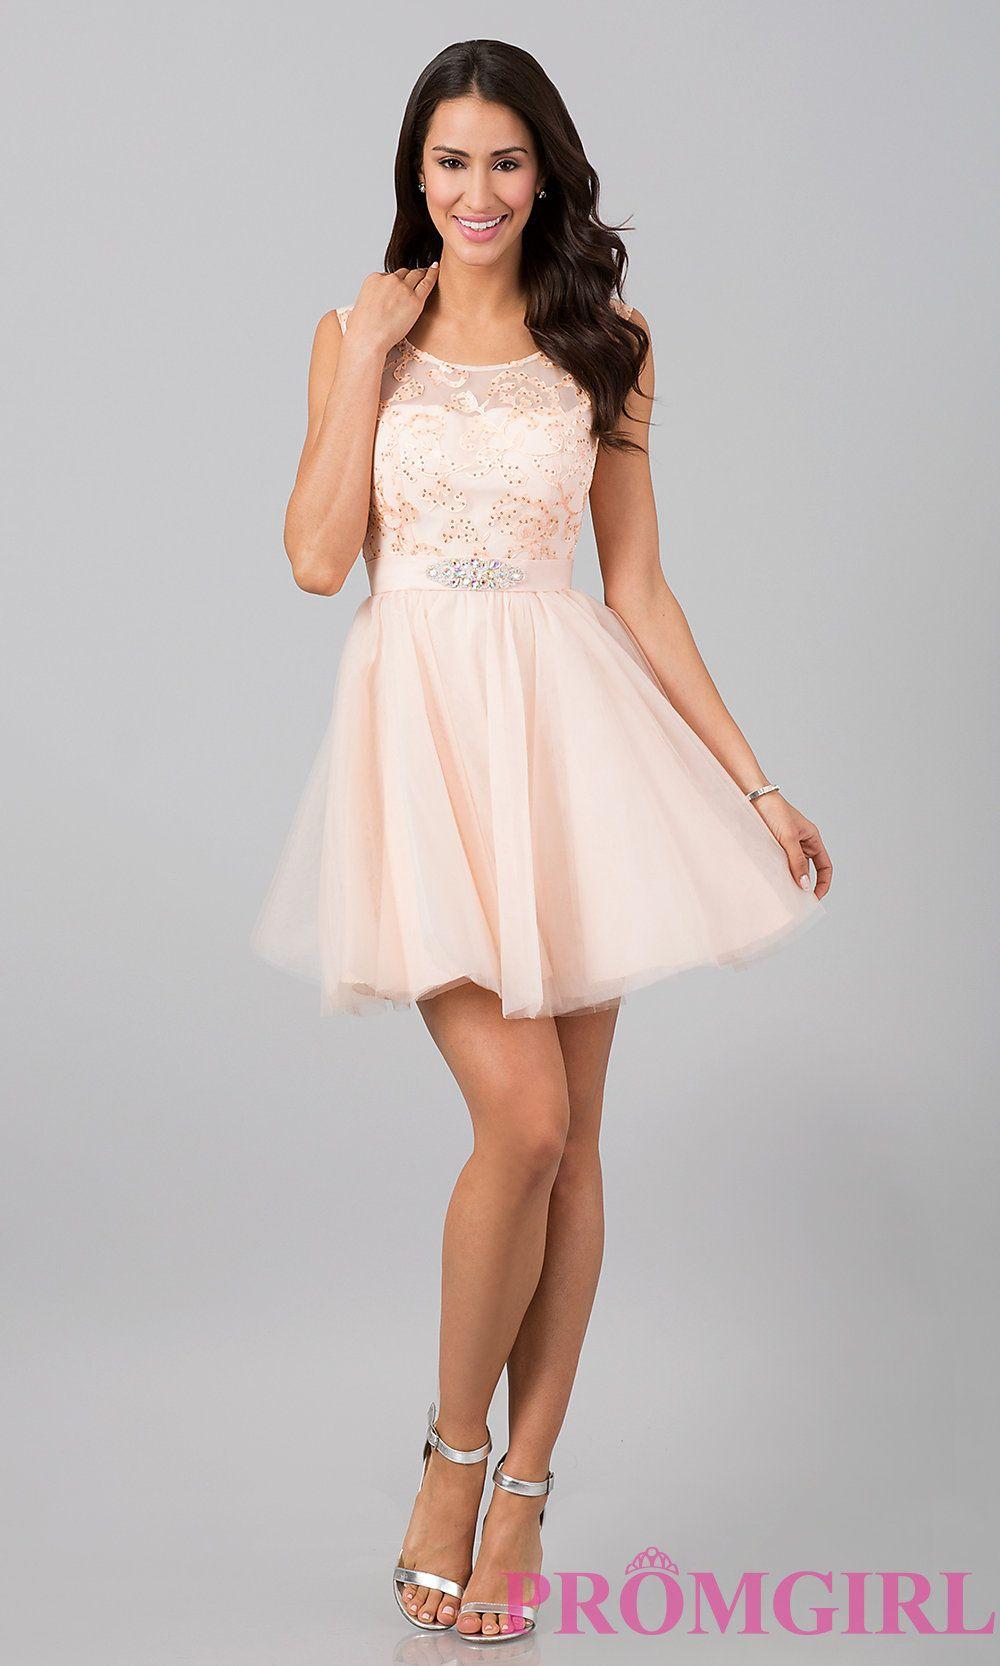 Short Sleeveless Lace Dresses, Short Lace Prom Dresses- PromGirl ...